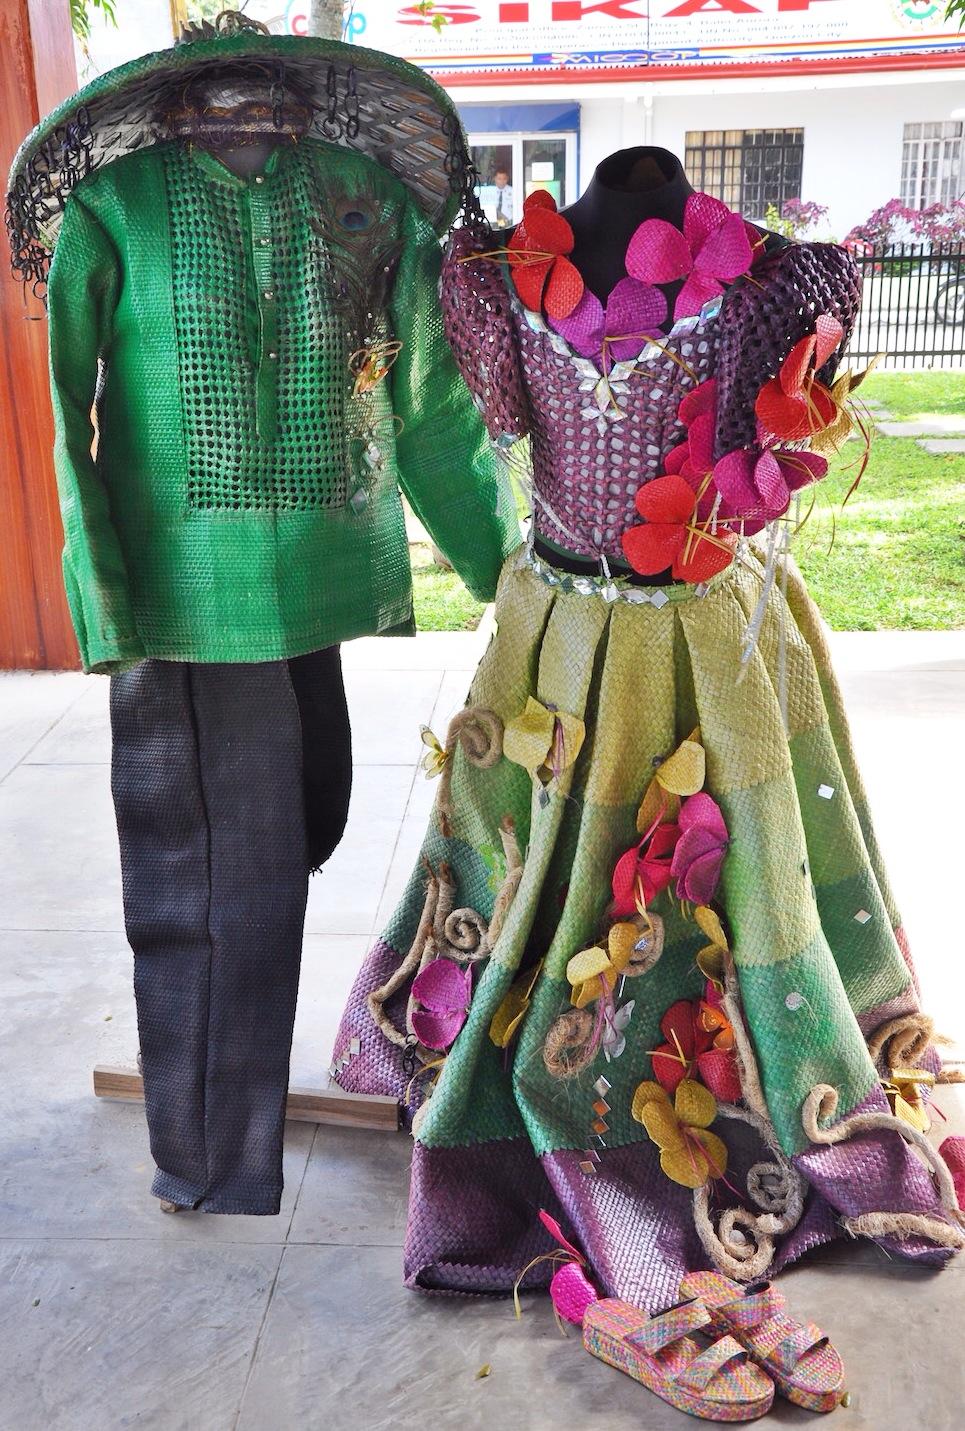 Filipiniana Costumes Filipiniana Costume at Dona